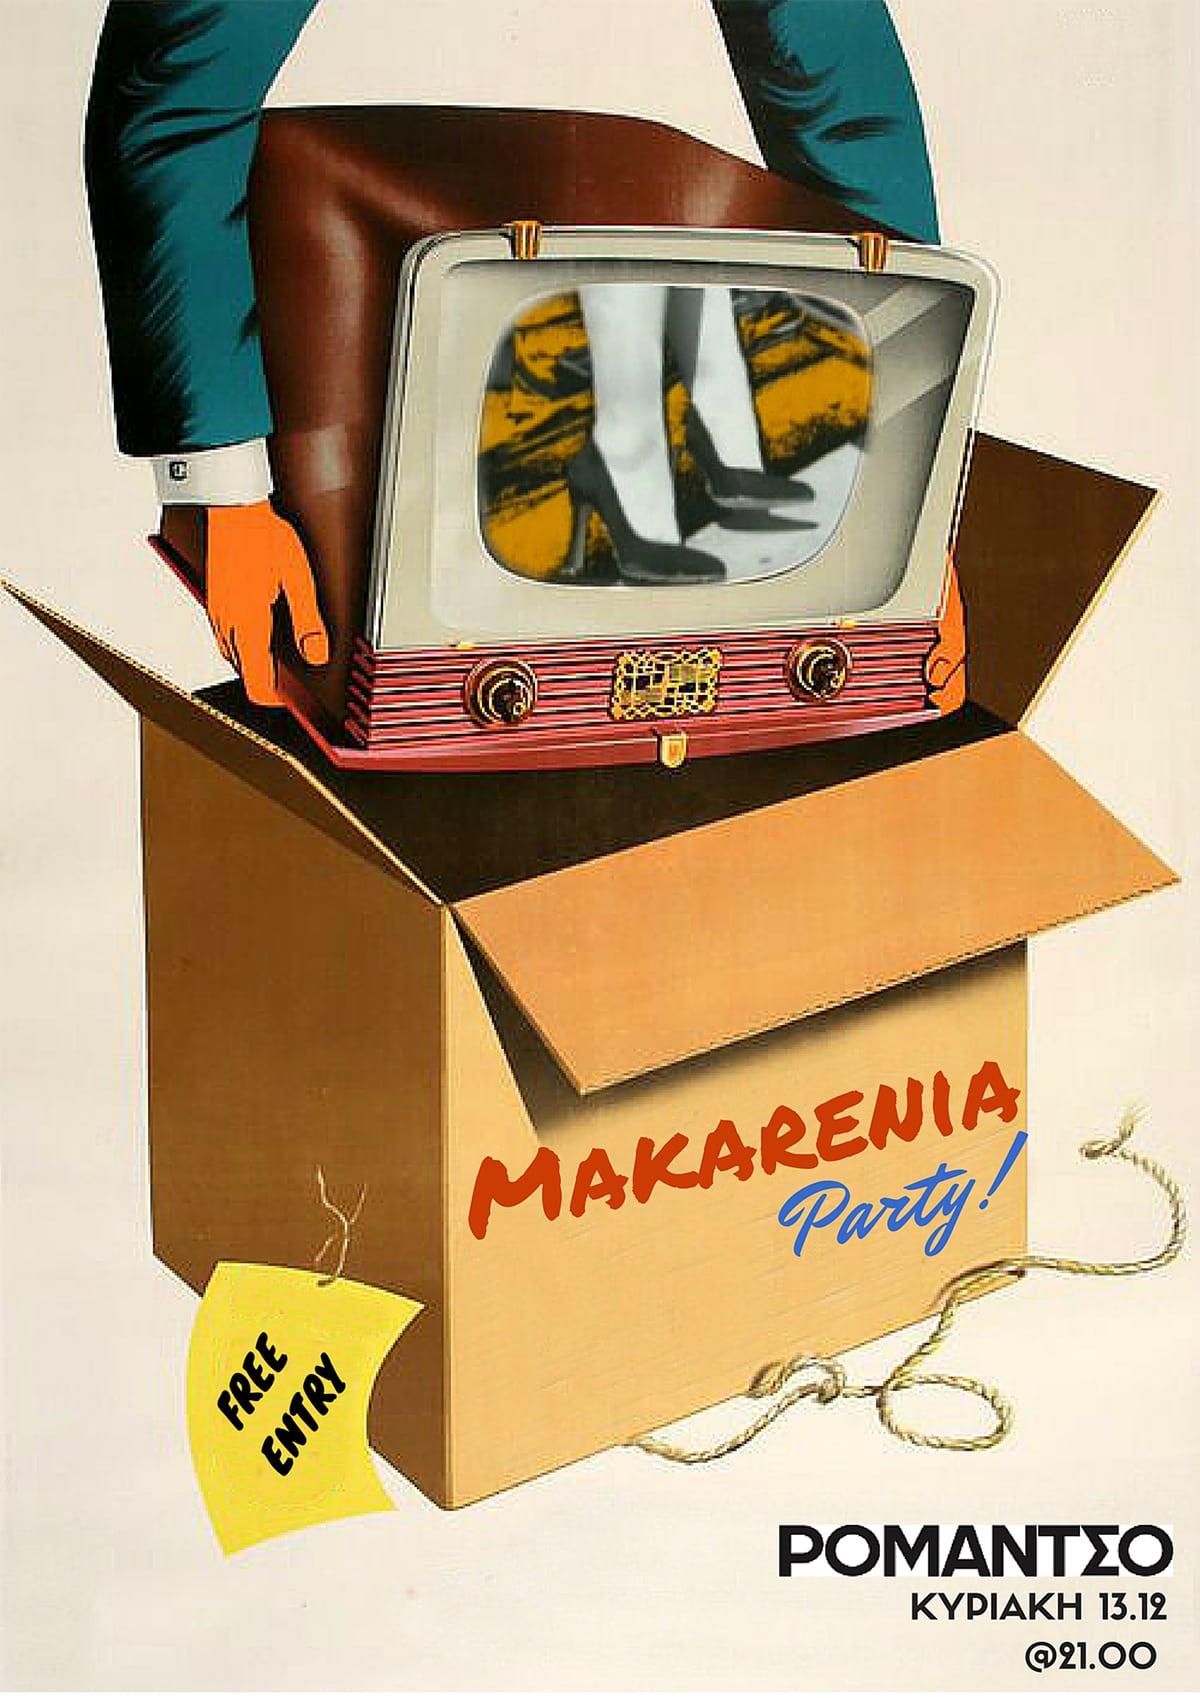 MAKARENIA PARTY FLYER (2)